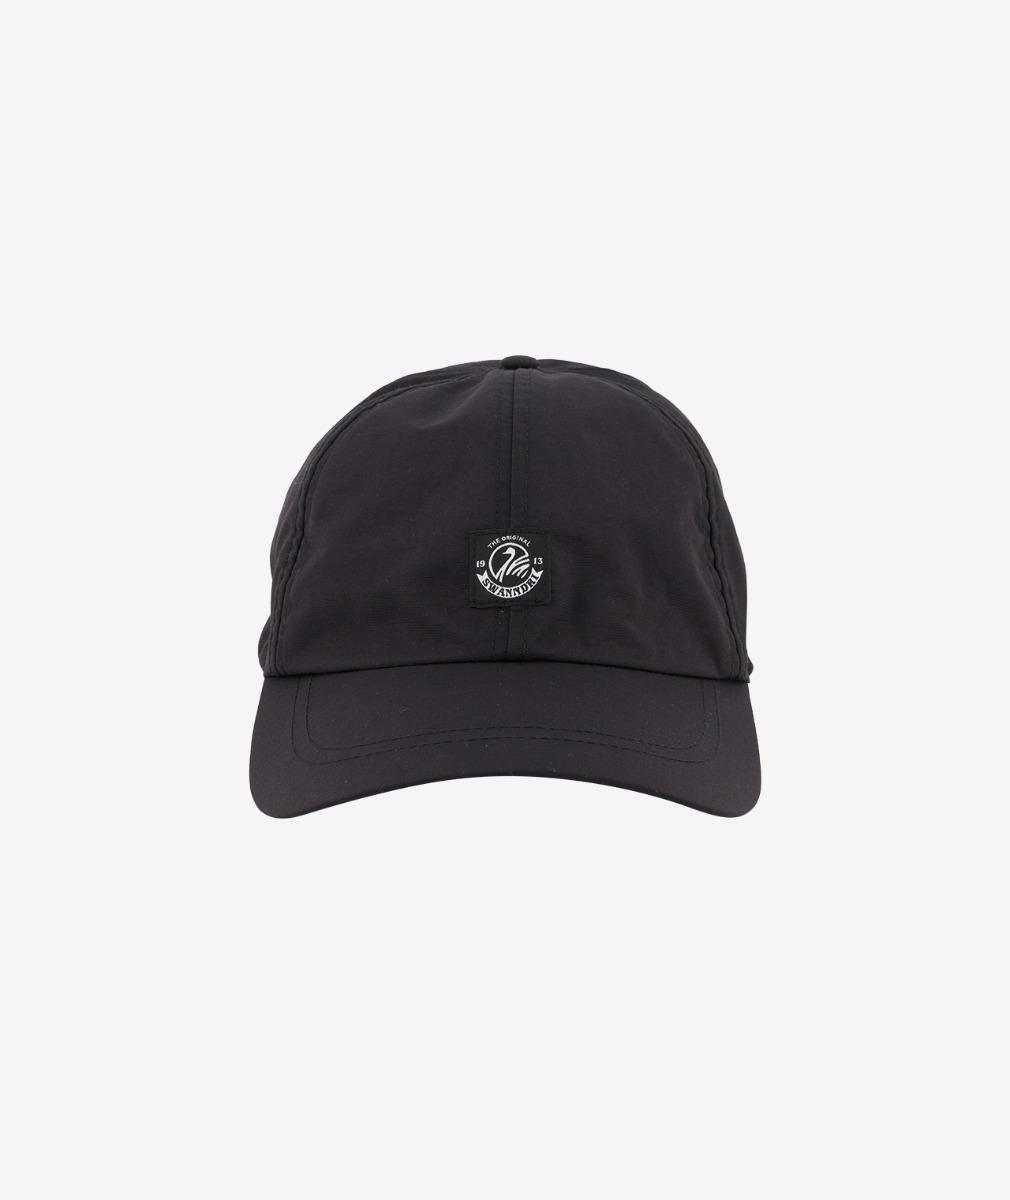 Swanndri Waiwera Cap in Black